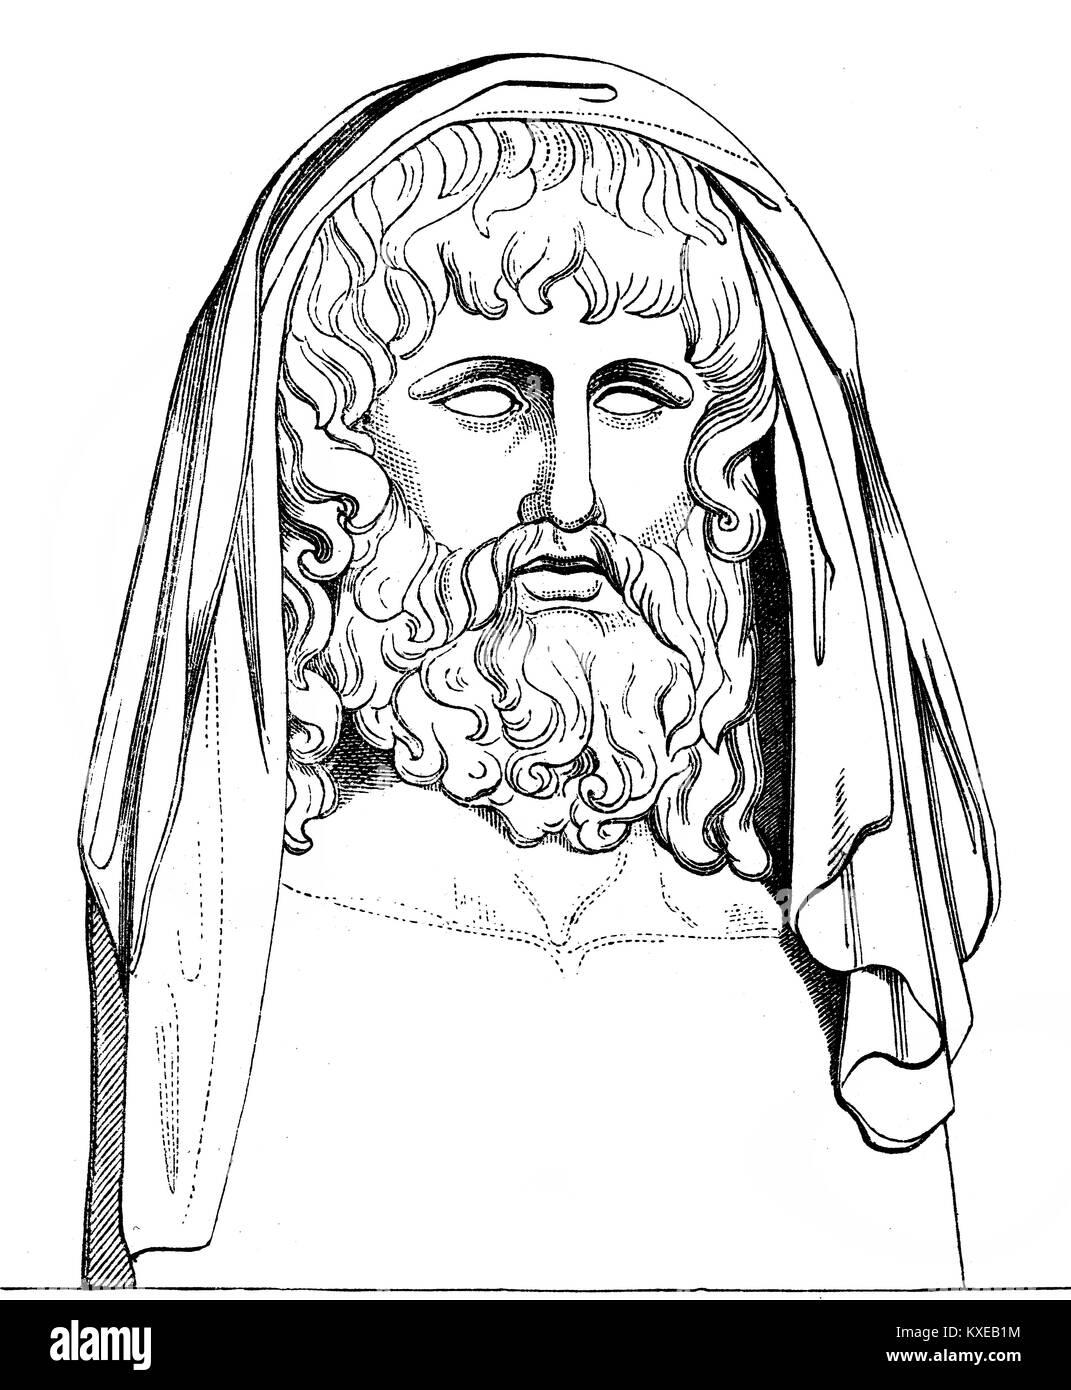 Mythology titan stock photos mythology titan stock images alamy cronus cronos or kronos greek mythology stock image buycottarizona Images